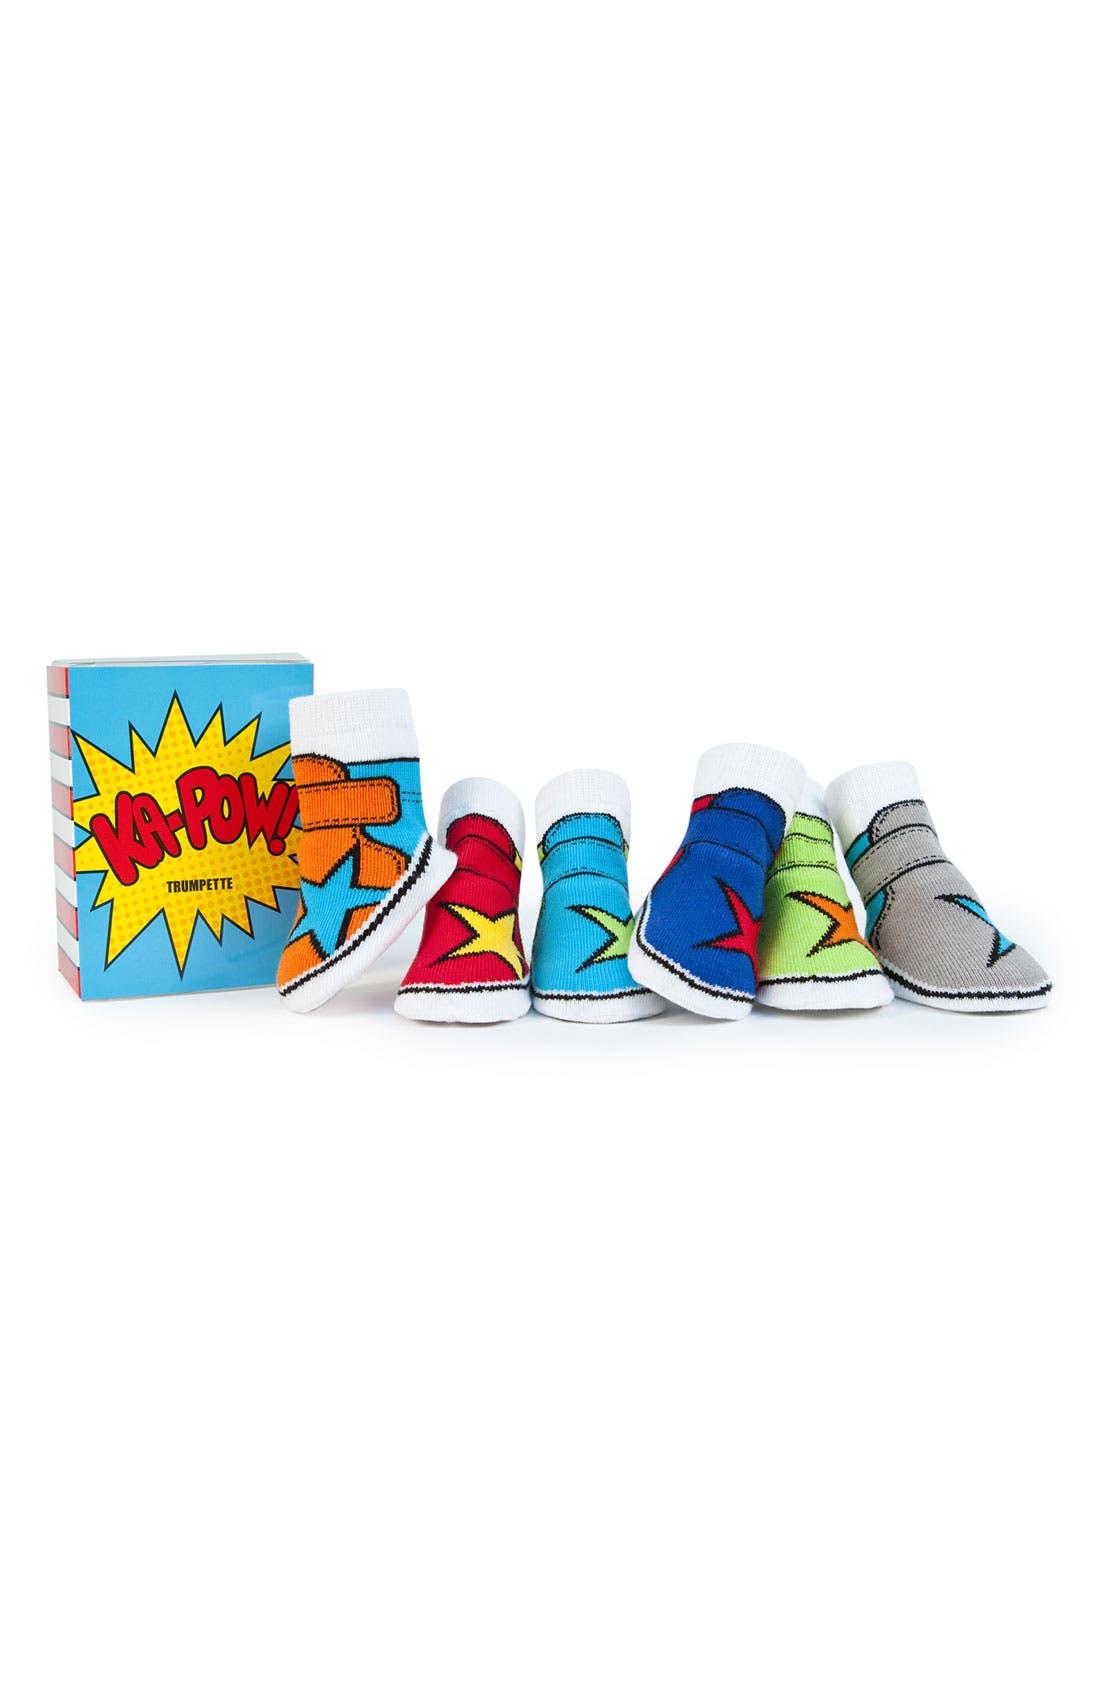 Alternate Image 1 Selected - Trumpette 'Ka Pow' Socks Gift Set (Baby Boys)